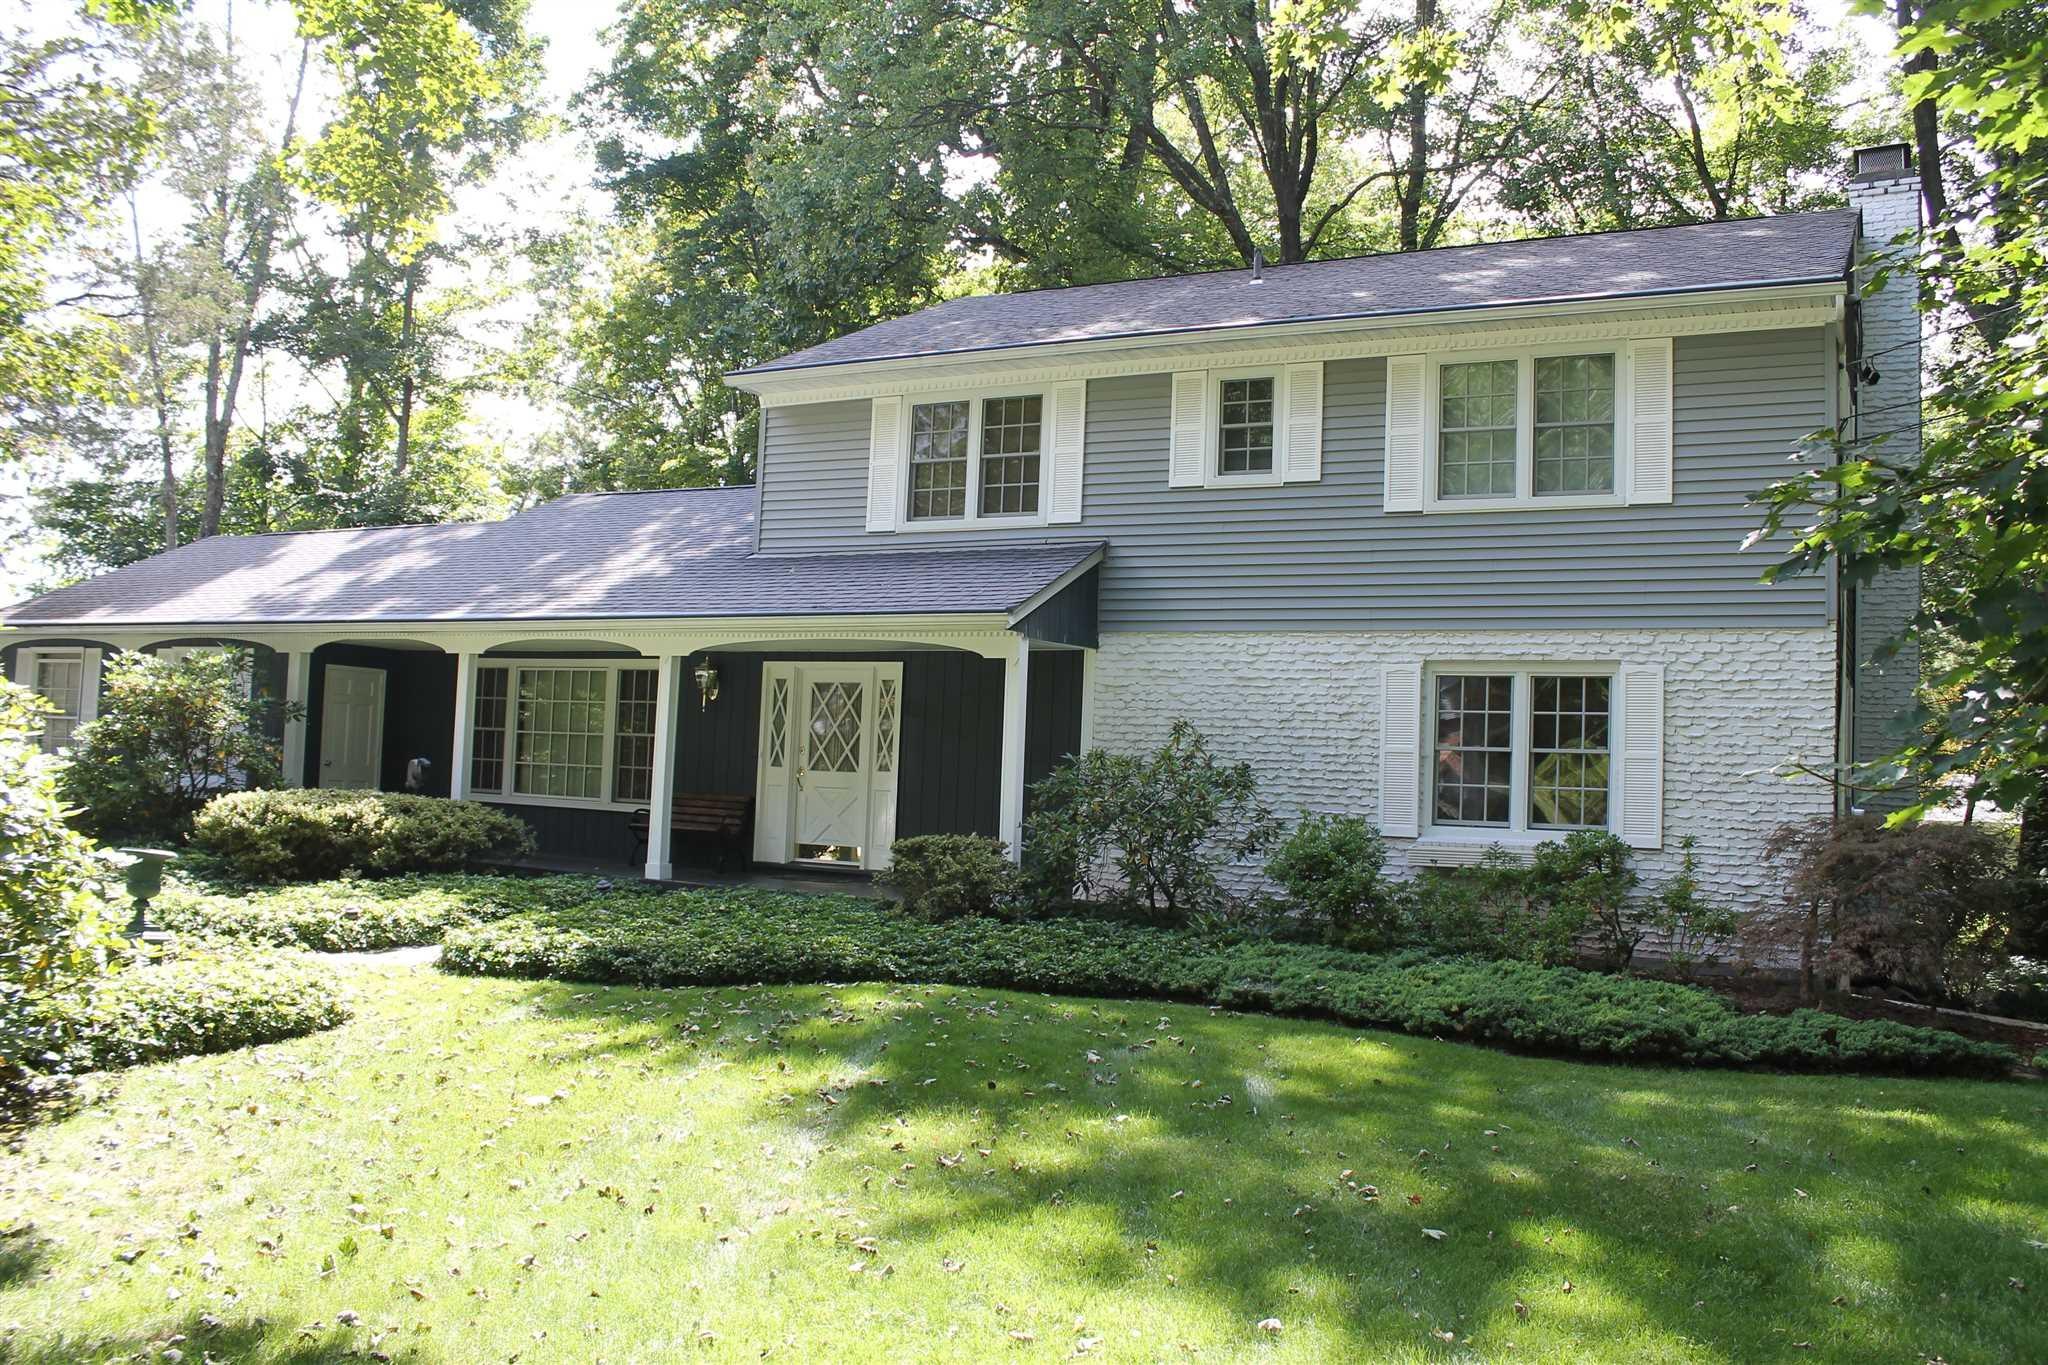 Single Family Home for Sale at 6 OAK Court 6 OAK Court Poughkeepsie, New York 12603 United States